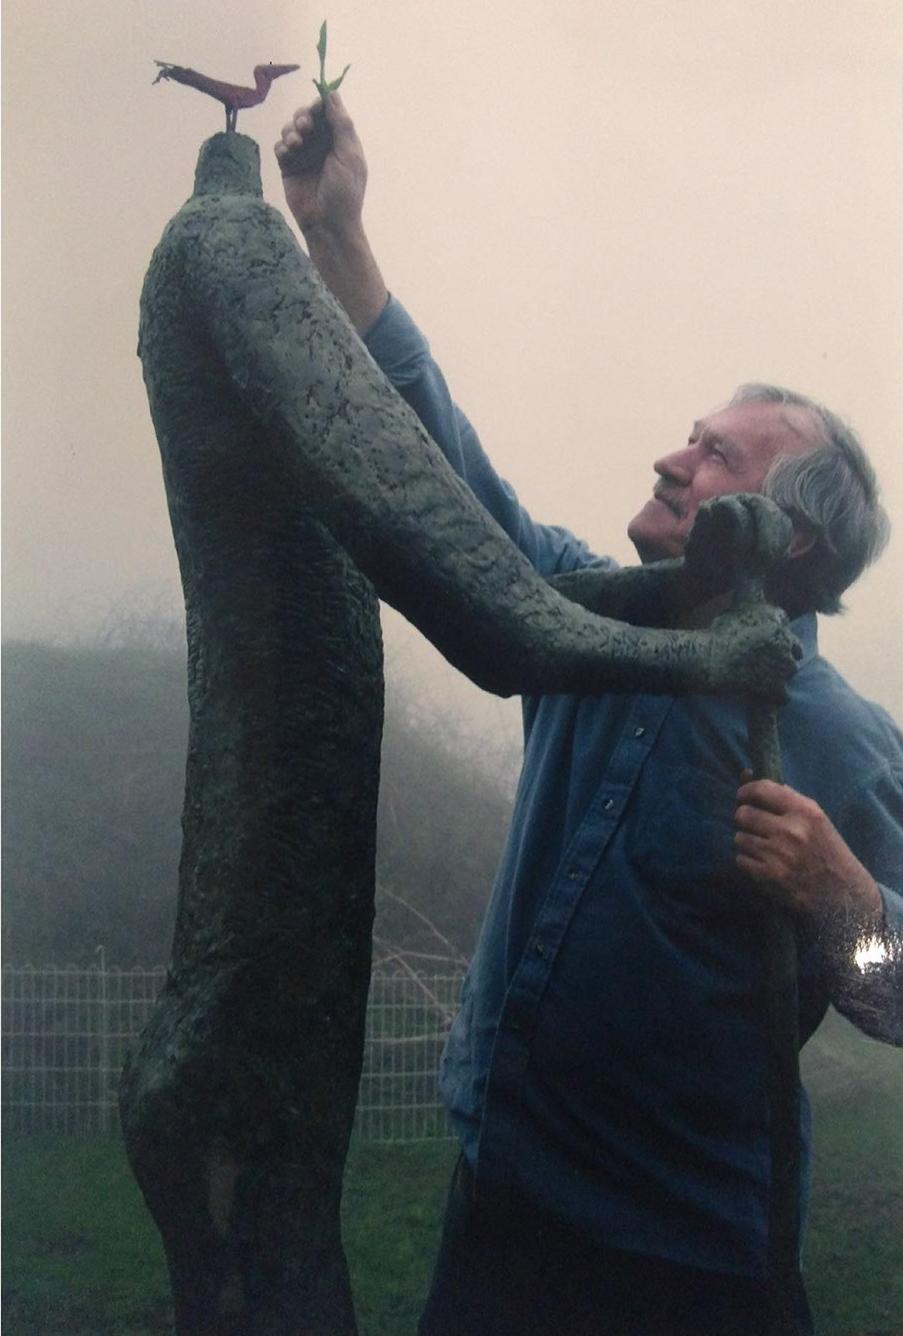 Robert E. Kuhn, Tanners Ridge, Virginia, 1980.